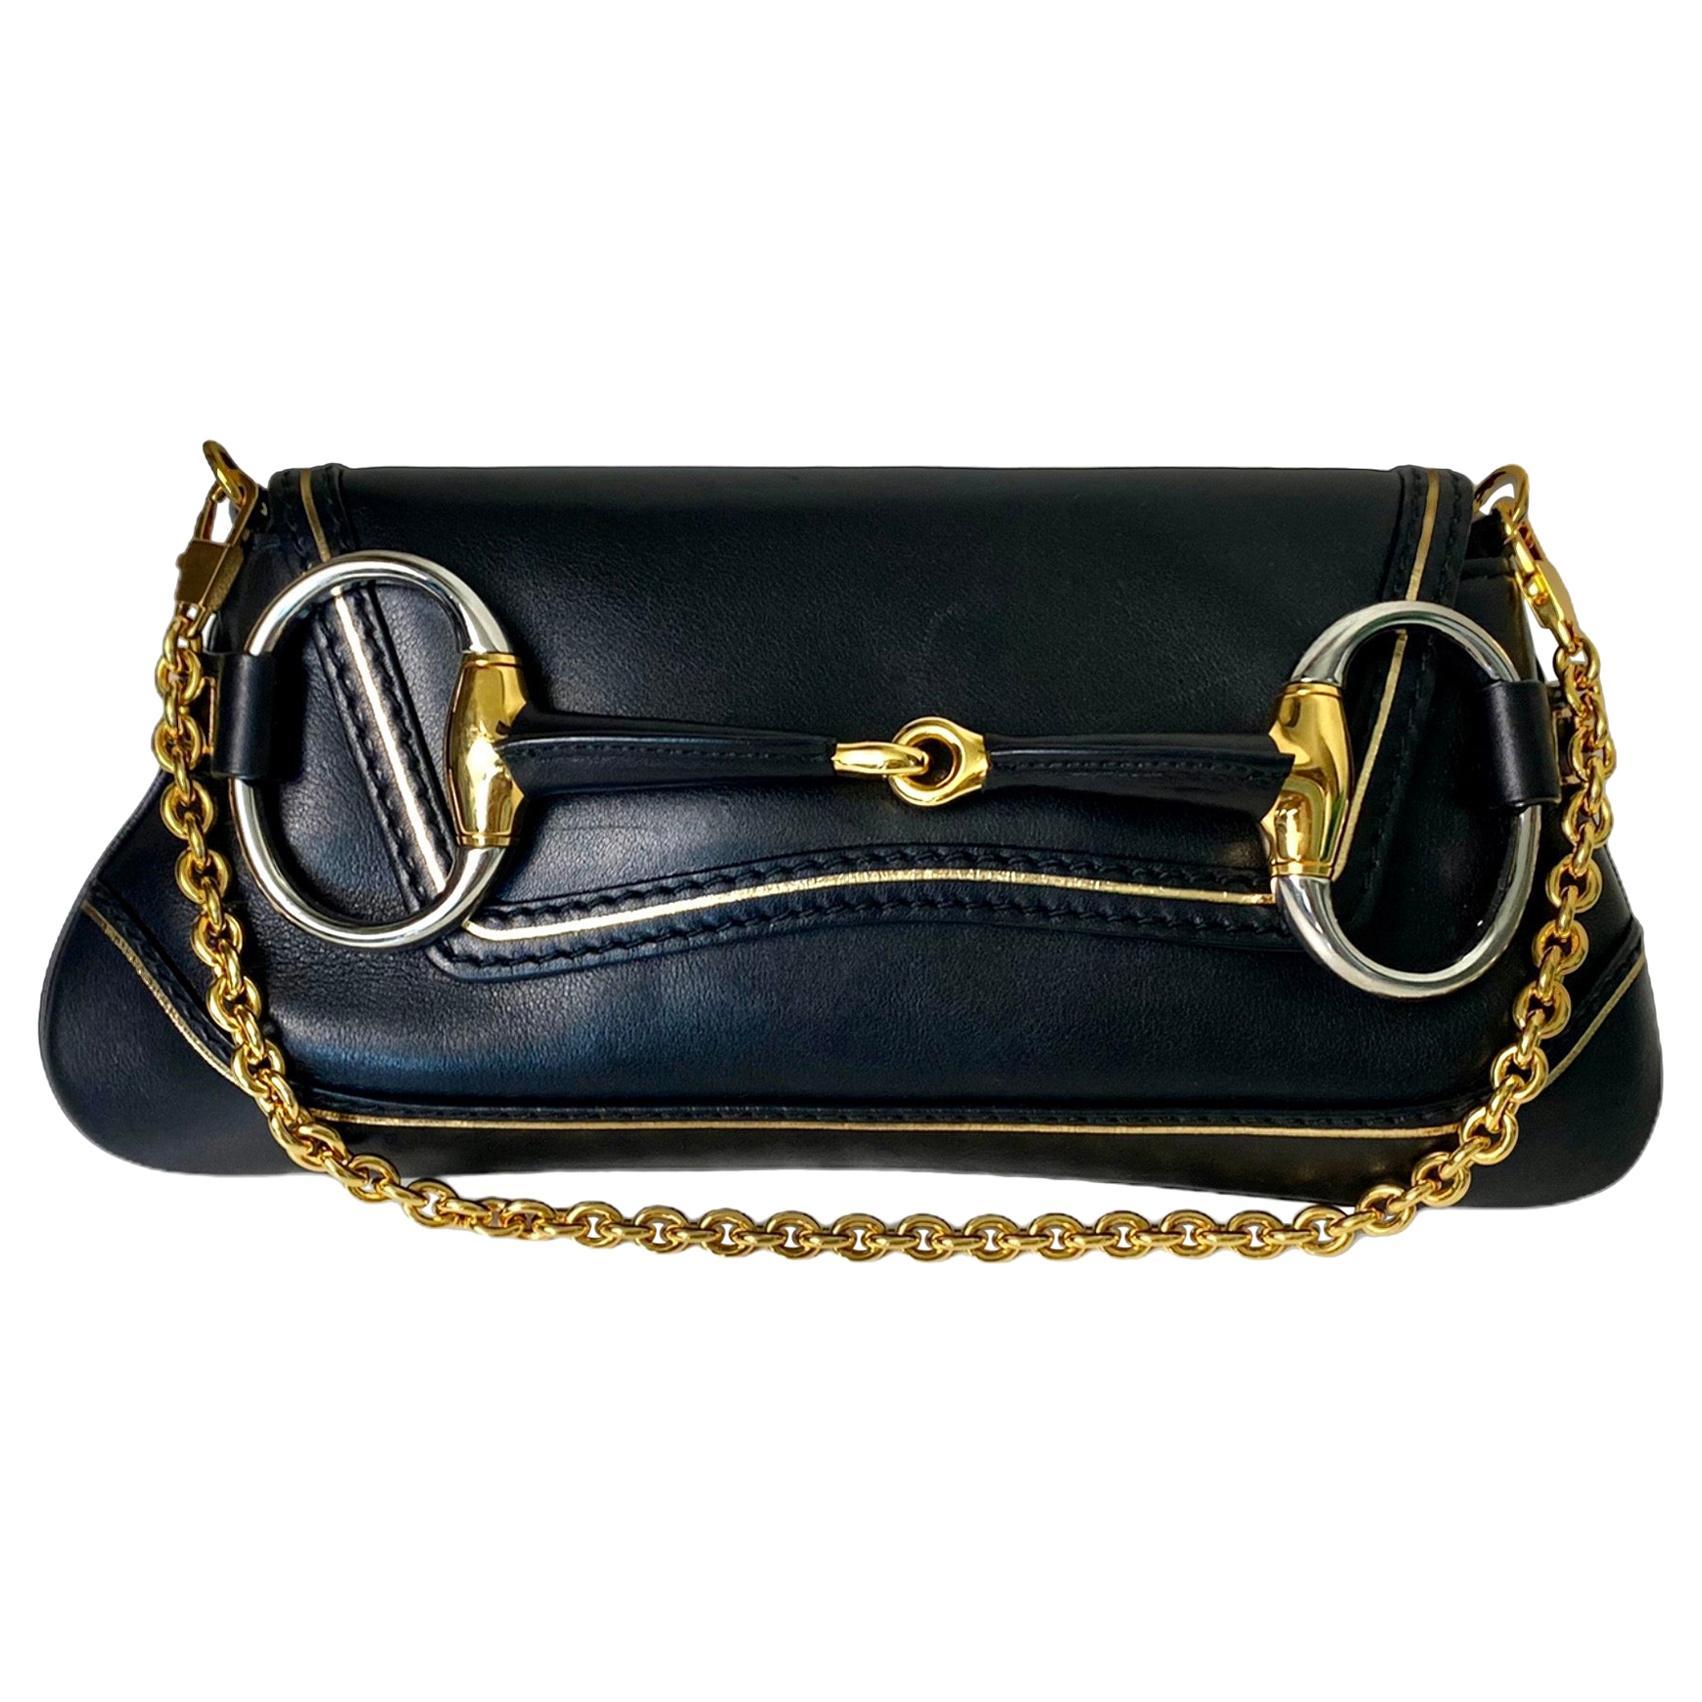 UNWORN Gucci Limited Edition Black Leather Painted Flora Horsebit Bag Clutch